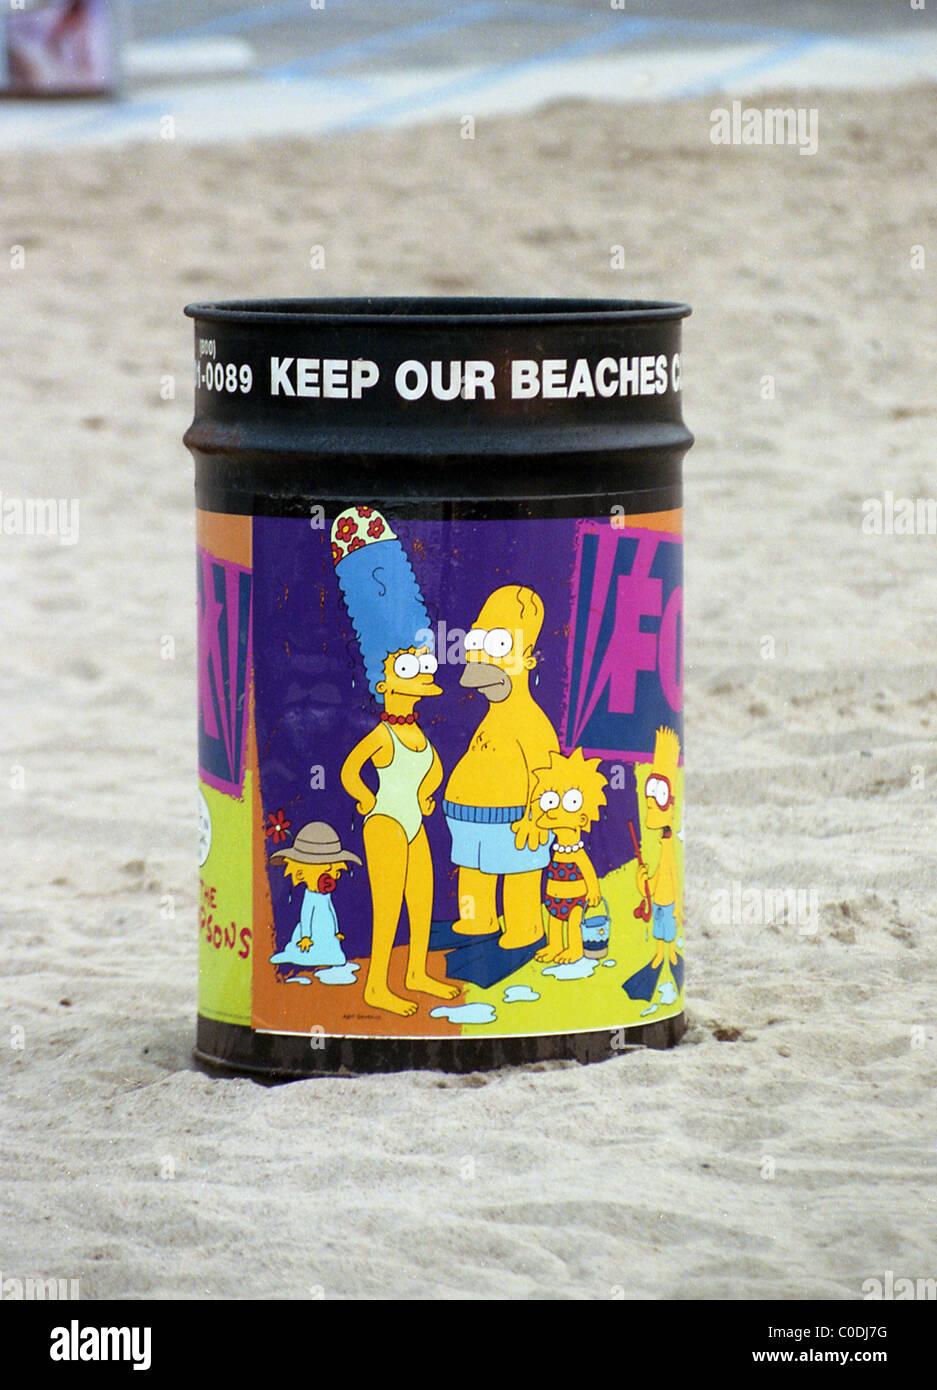 The Simpsons rubbish bin on Venice Beach, Los Angeles, California. - Stock Image